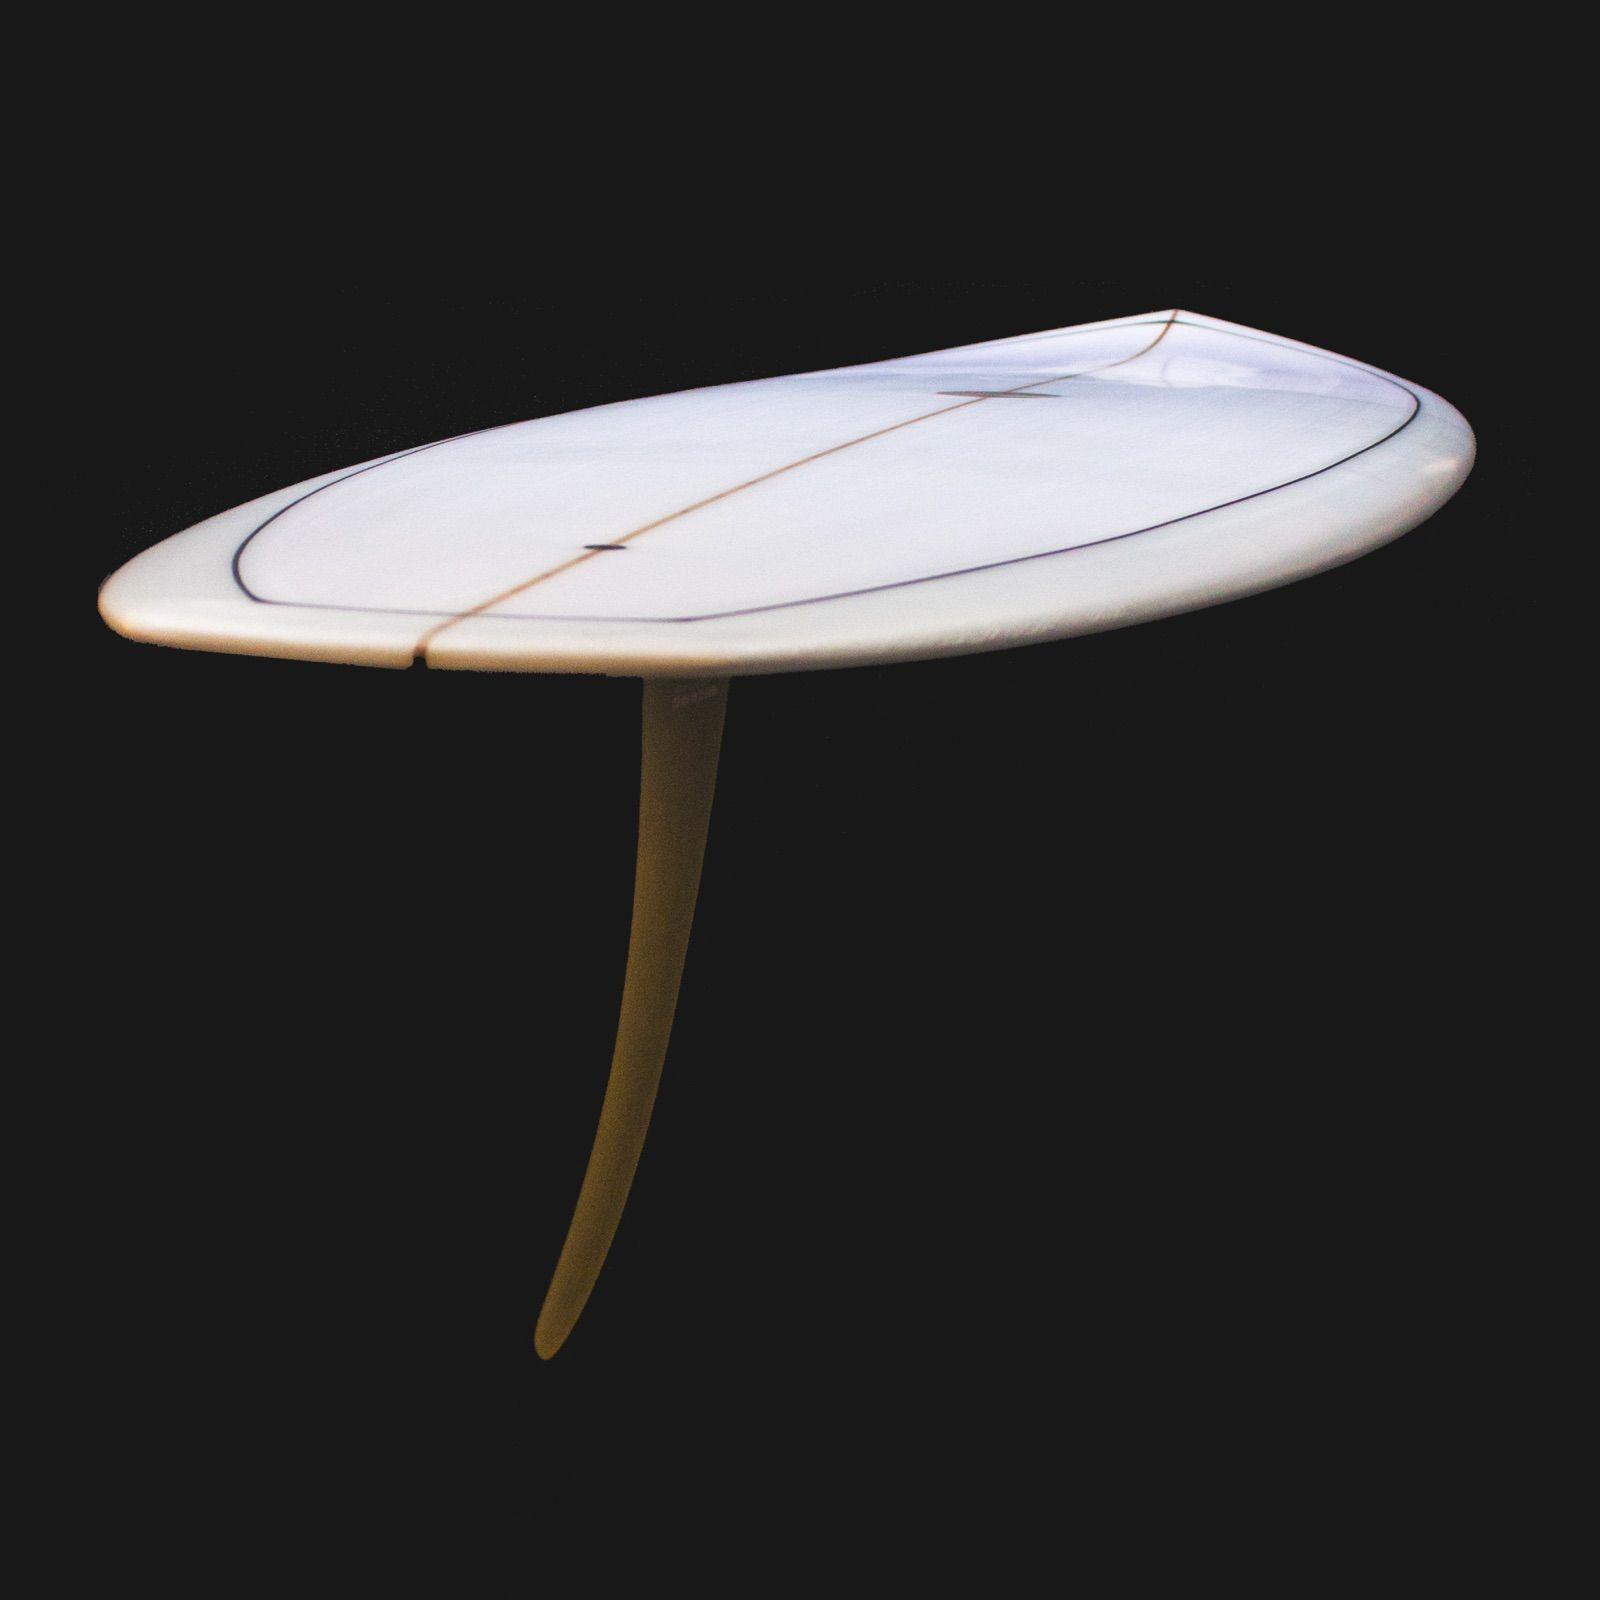 7'2 Transitional Period Inspired Single Fin Surfboard Aka